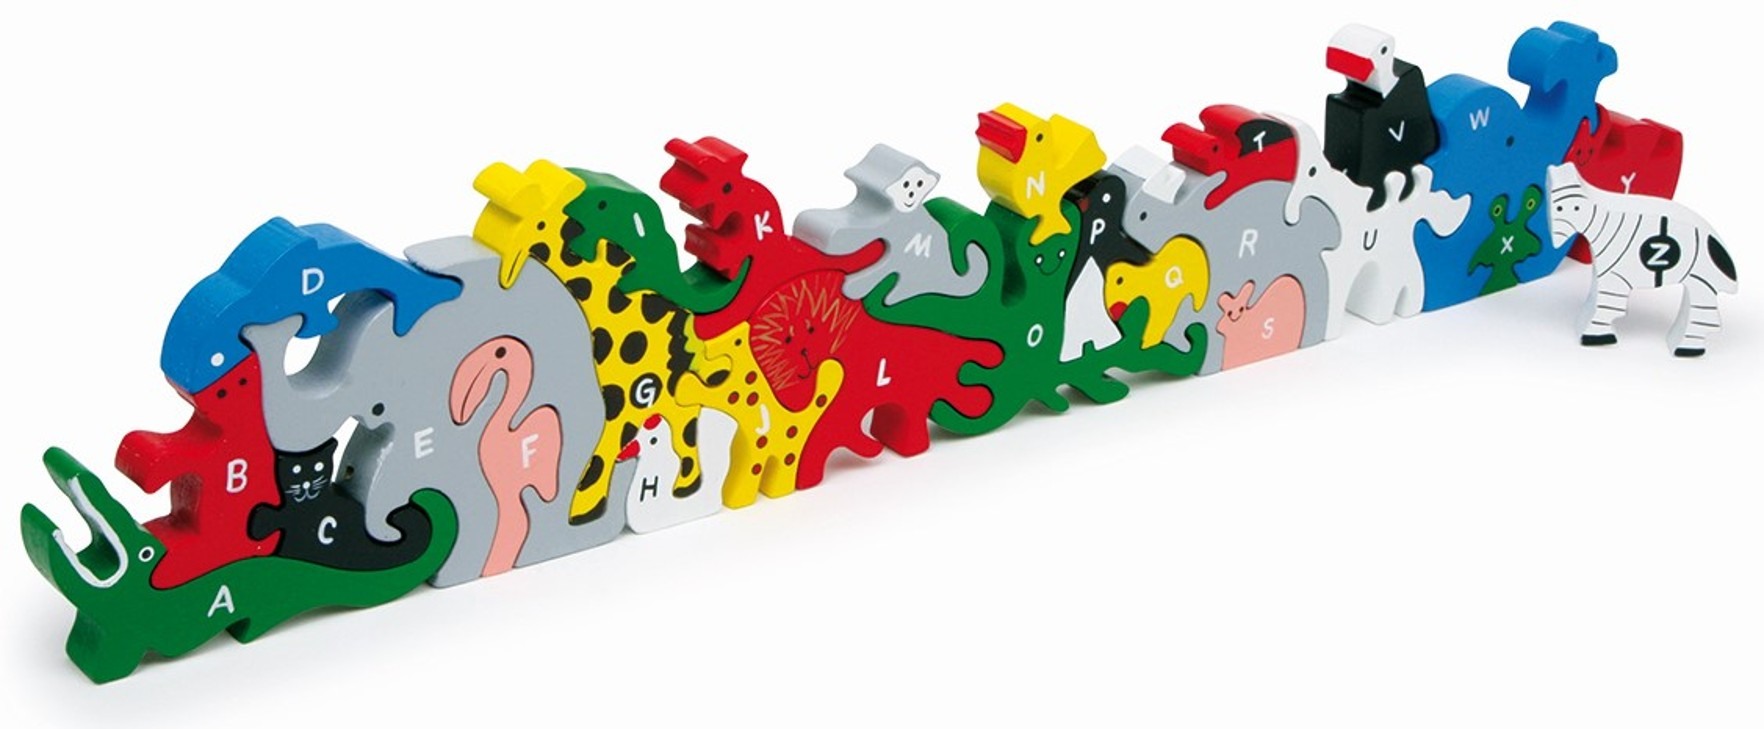 Skládačka Zvířata s písmeny a číslicemi (Dřevěná hračka)